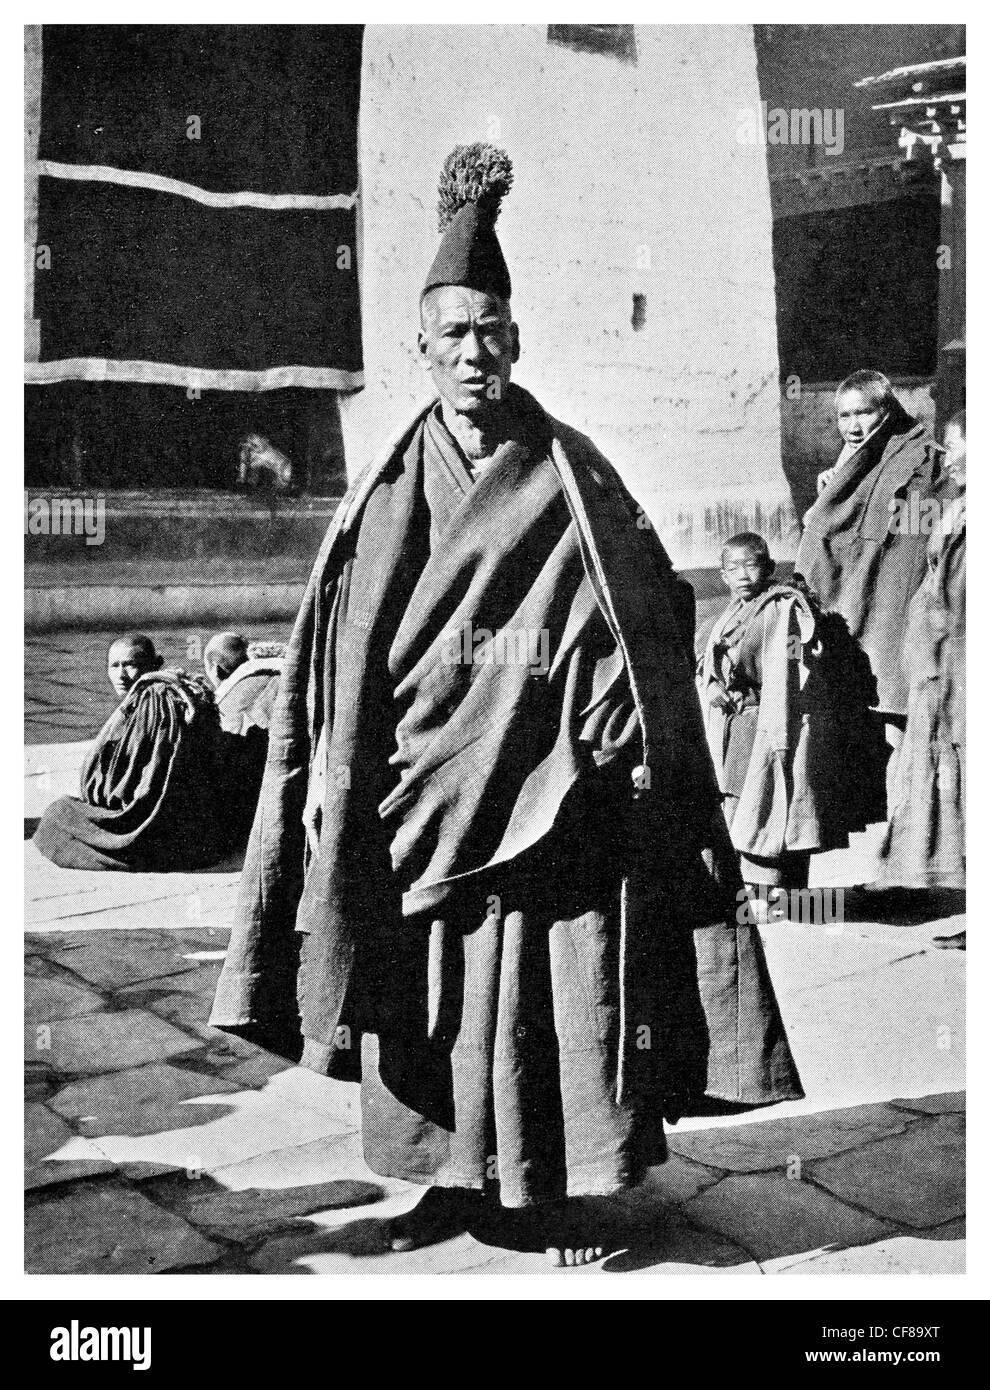 1926 Tungchuling Lama ceremonial Robes yellow sect Tibetan Church - Stock Image